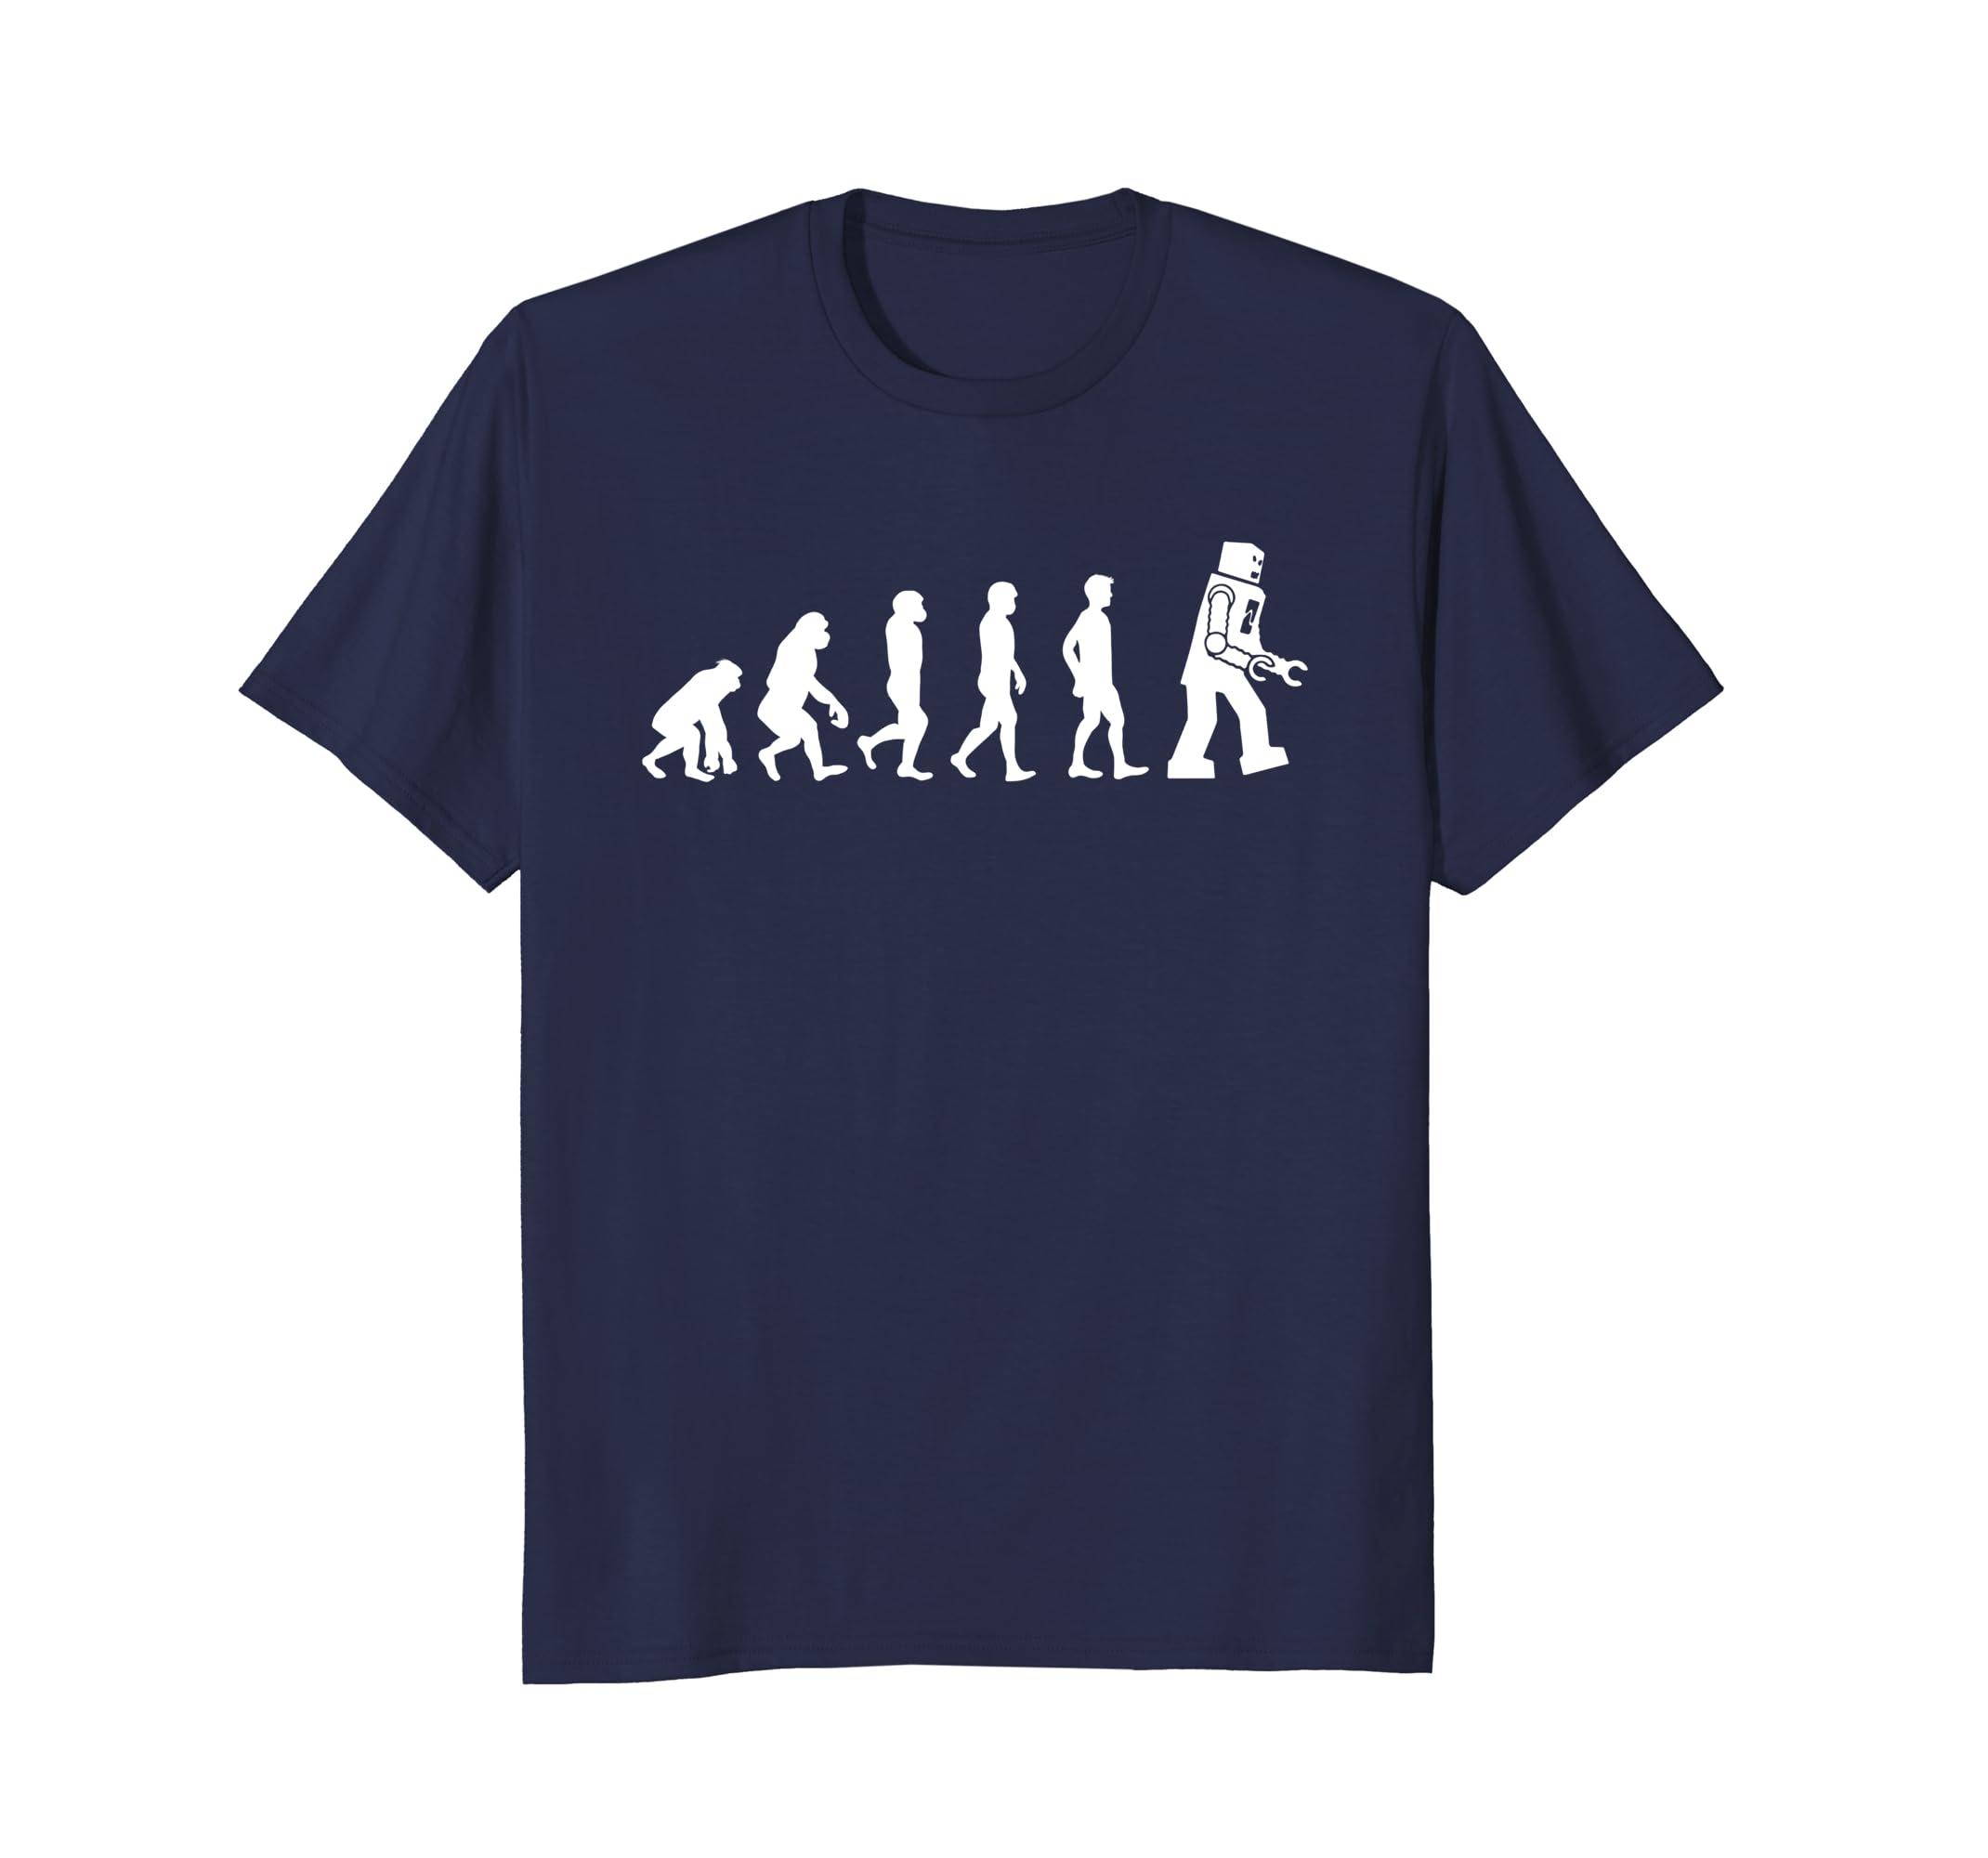 Funny Tees - Ape, Monkey, Man to Robot Evolution T-Shirt-AZP